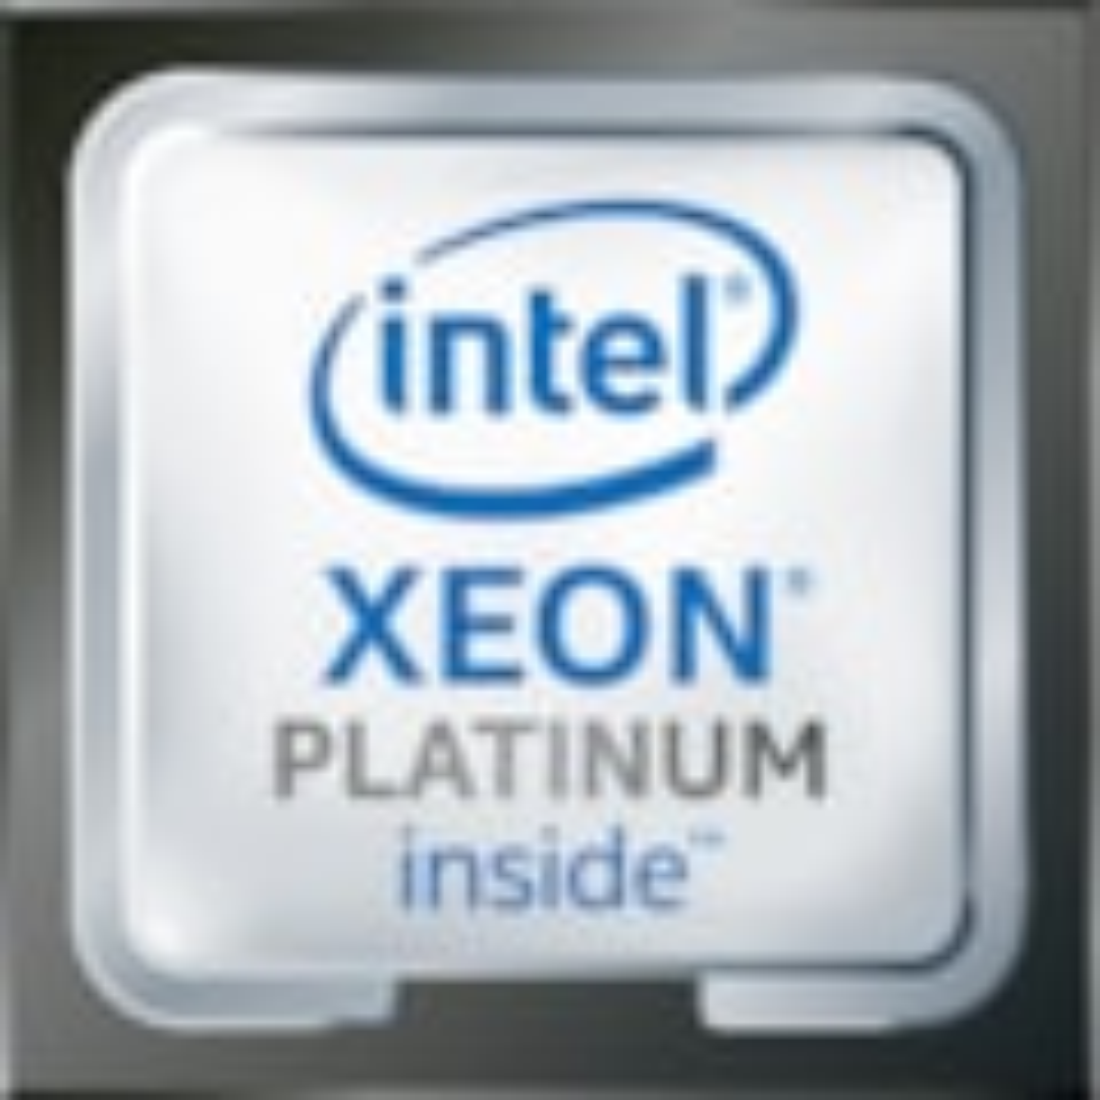 HPE Intel Xeon Platinum 8276M Octacosa-core (28 Core) 2.20 GHz Processor Upgrade